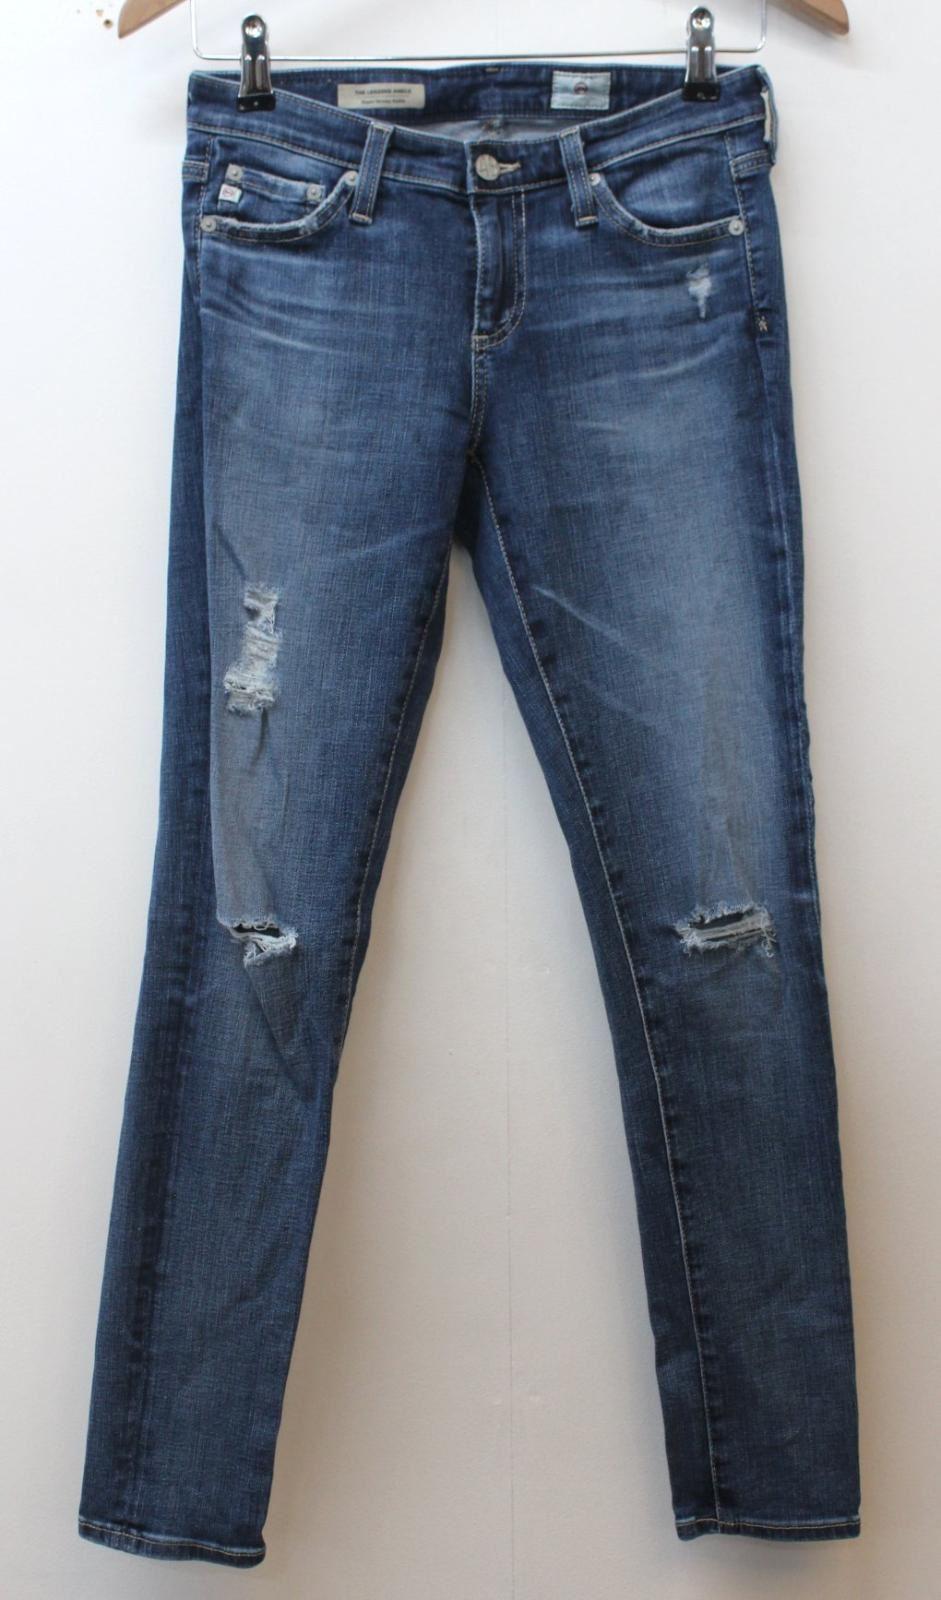 ADRIANO GoldSCHMIED Ladies Blau Legging Ankle Super Skinny Jeans W25 L26